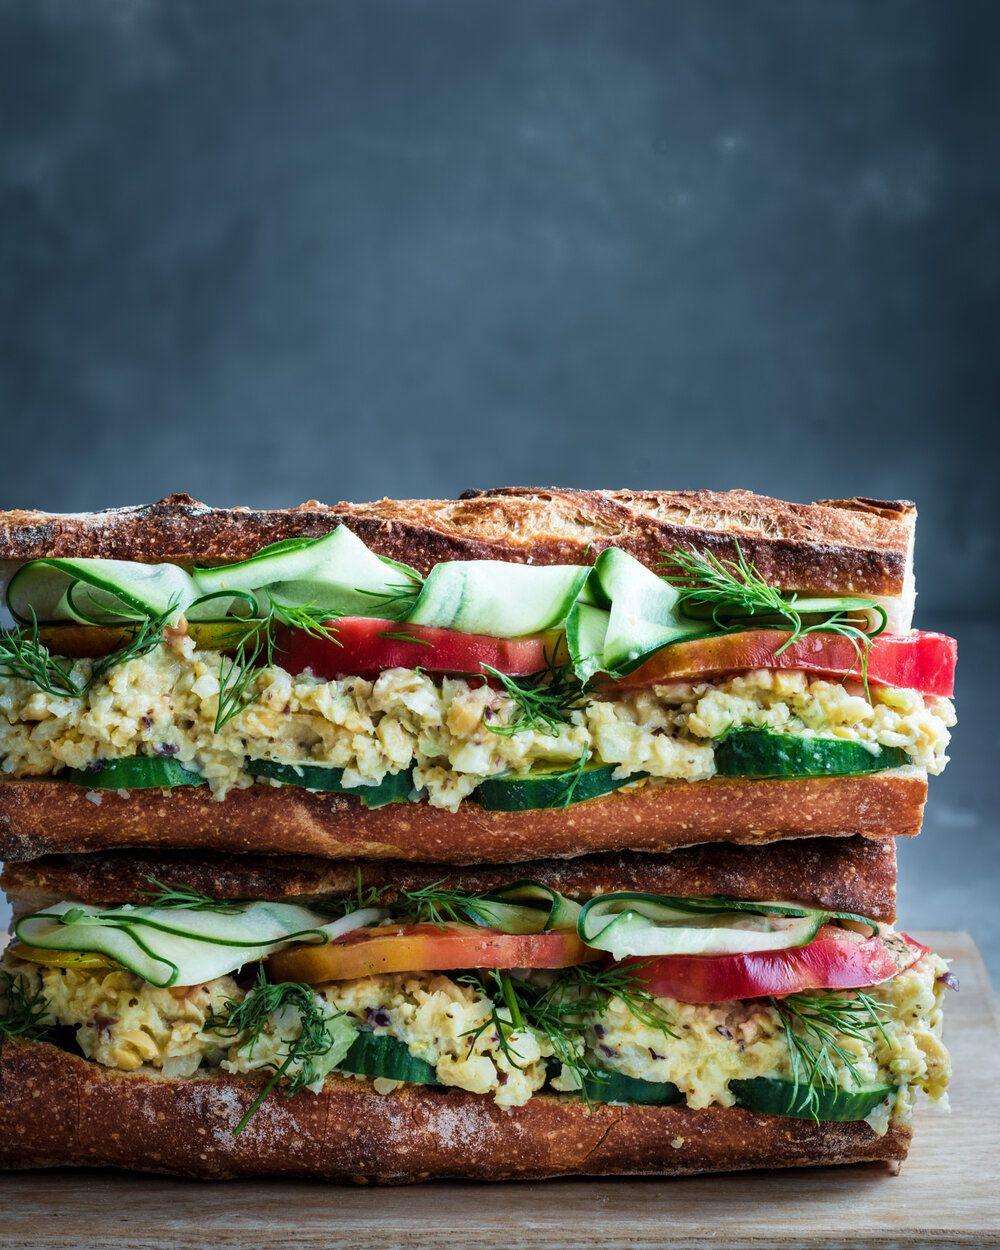 25 Easy Kid-Friendly Vegan Recipes